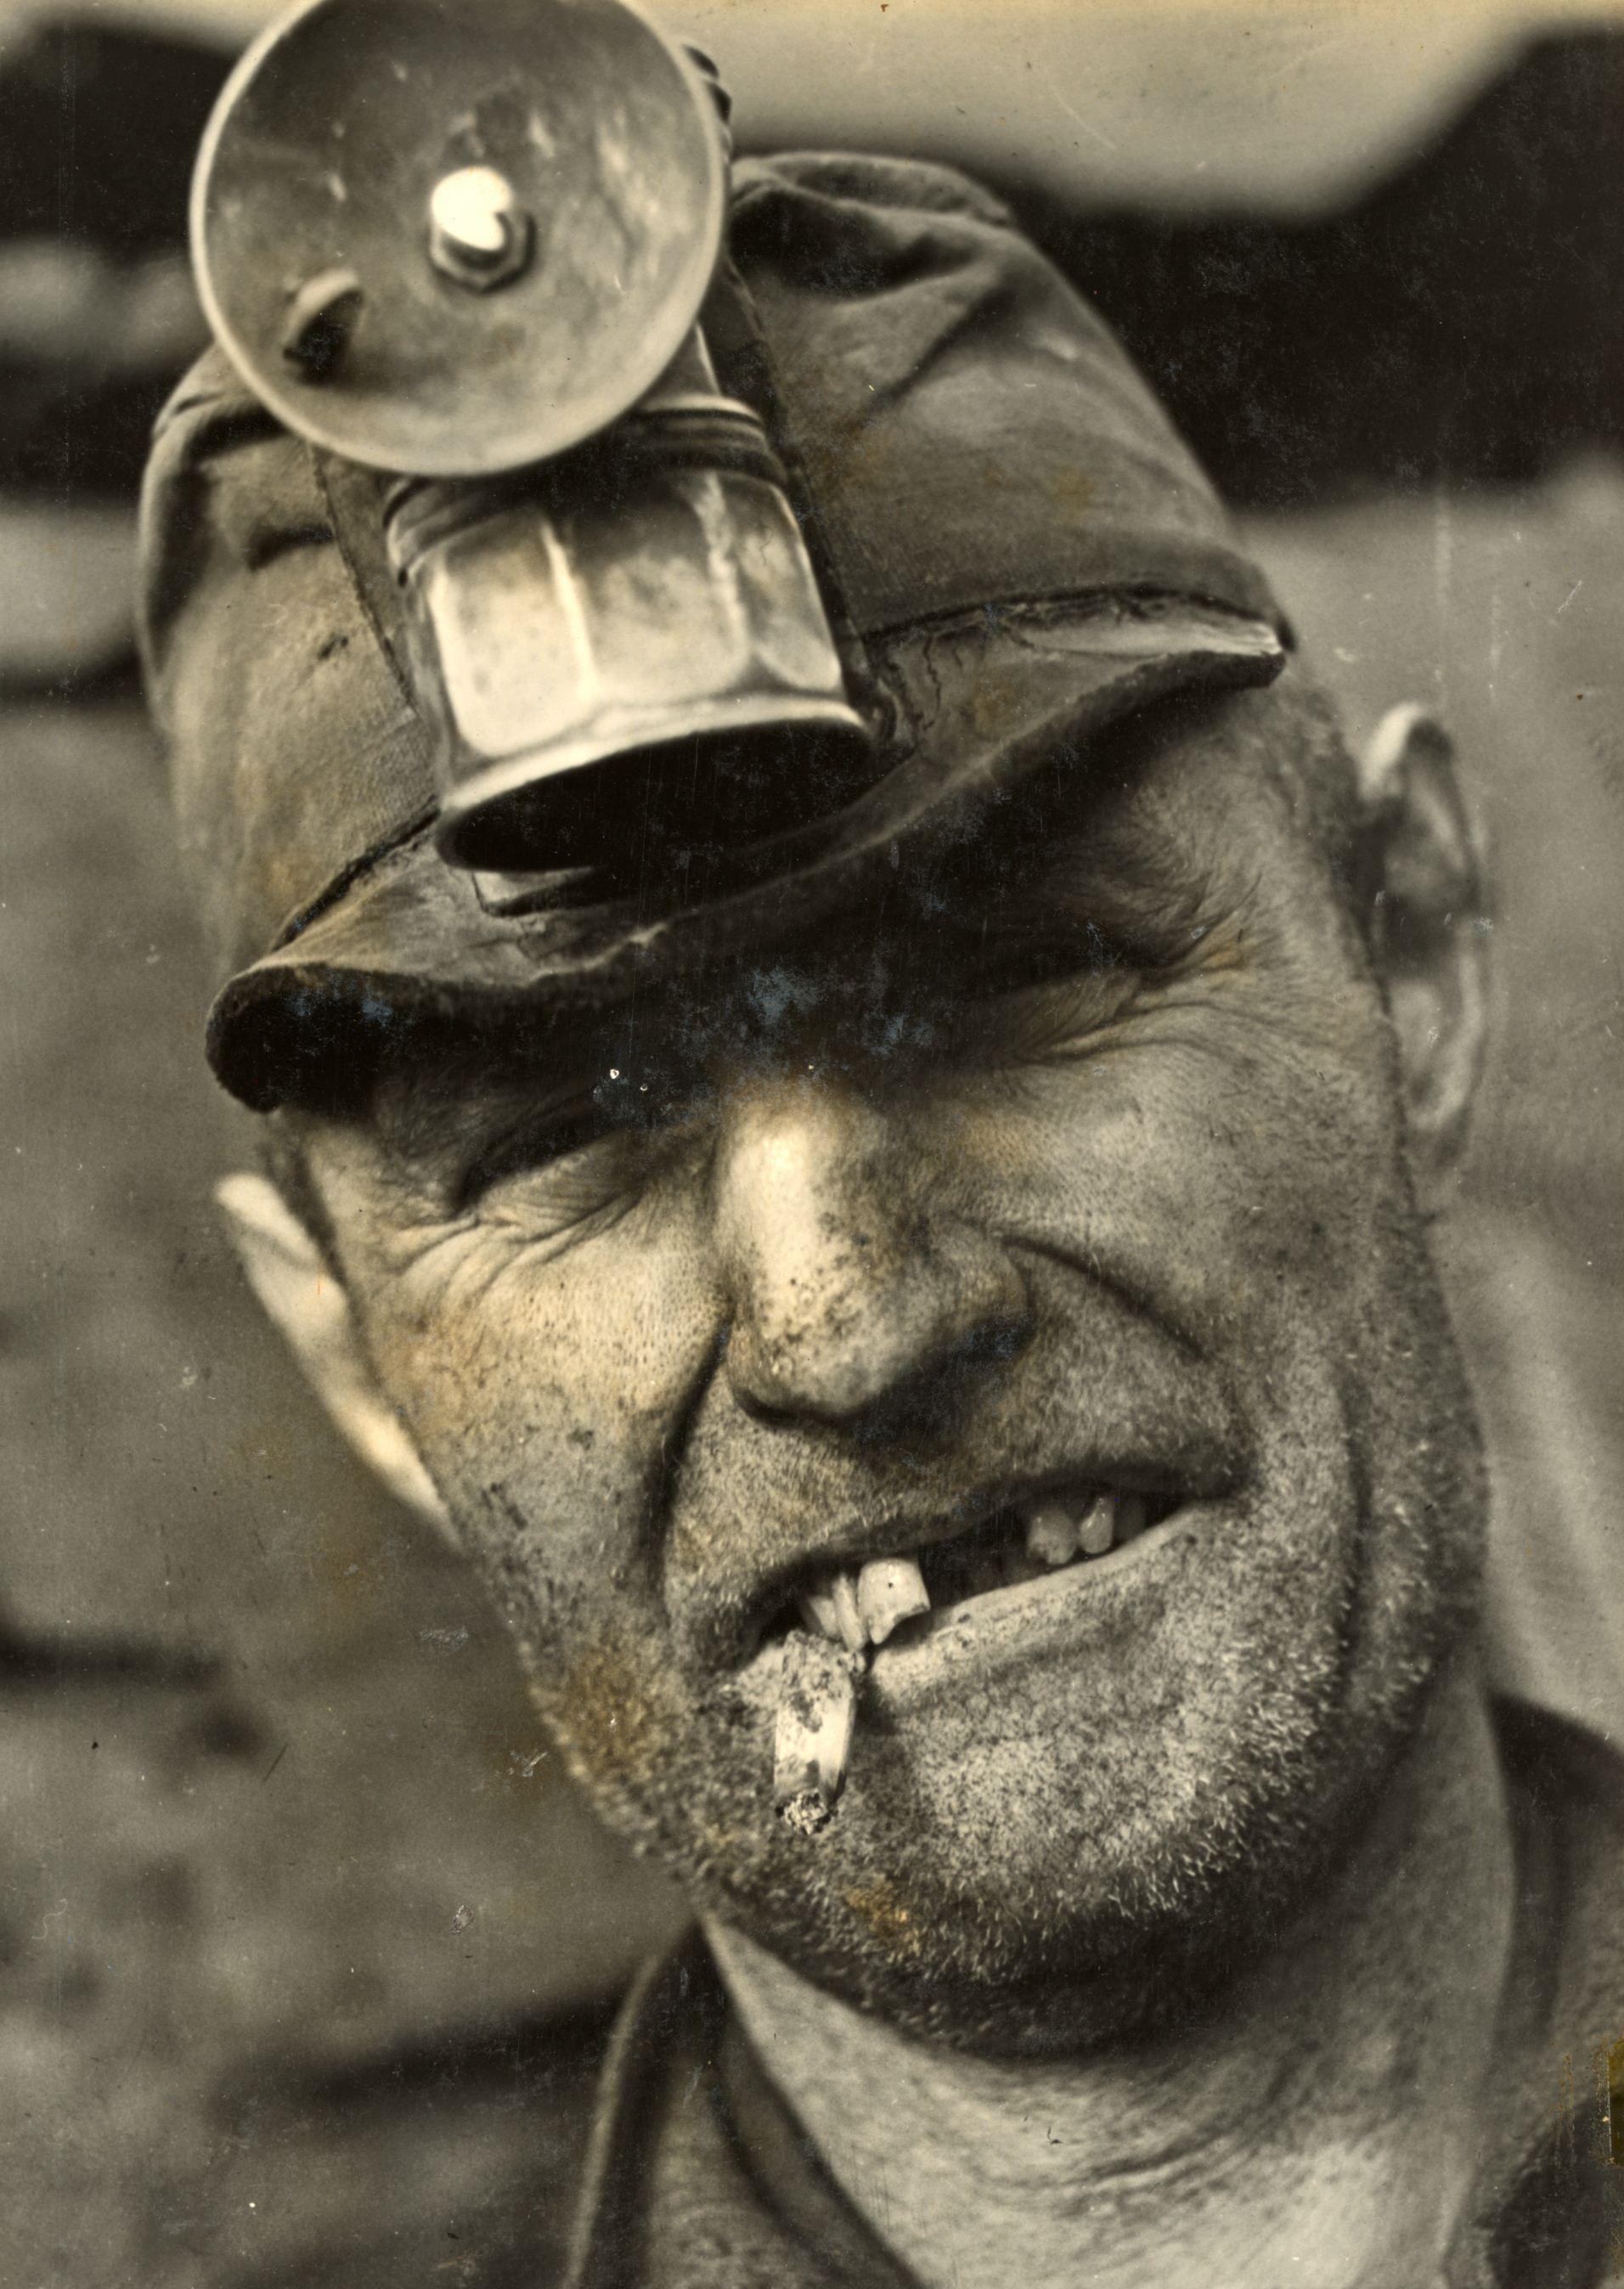 Jack Delano, Bootleg Coal Miner near Pottsville, PA, 1938. Gelatin silver print.